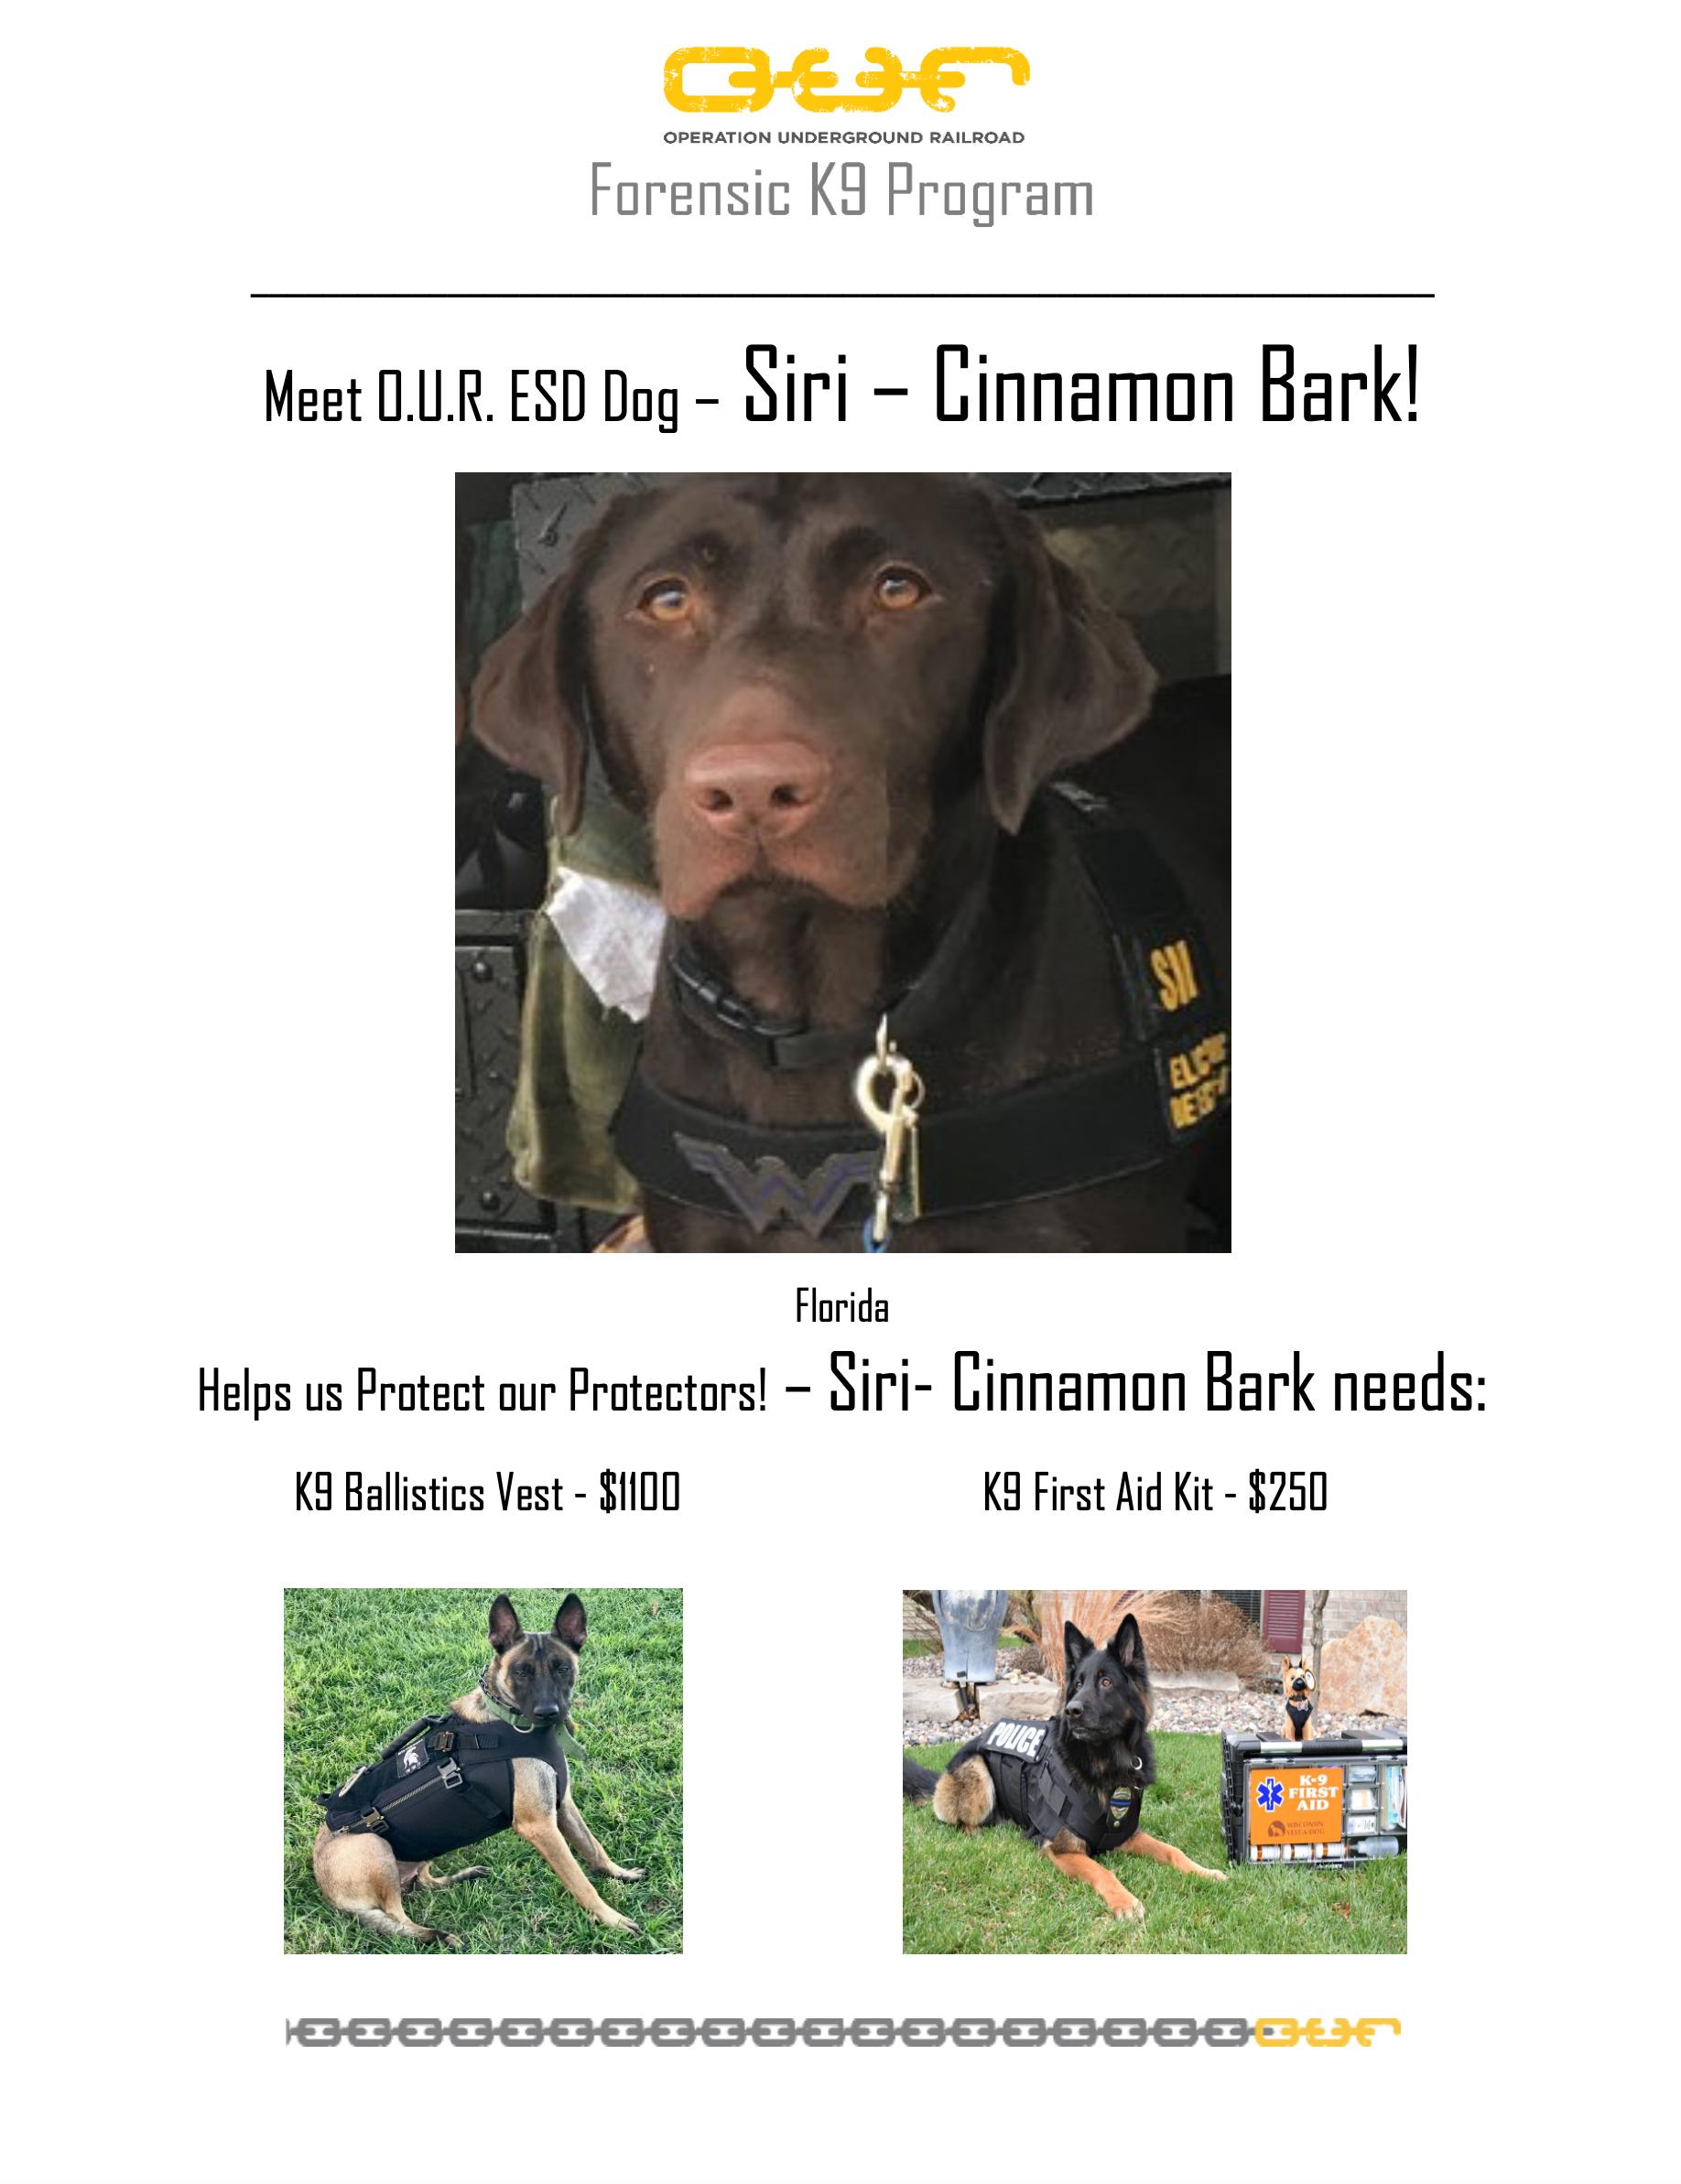 Protect Siri-Cinnamon Bark - Sanford, Florida